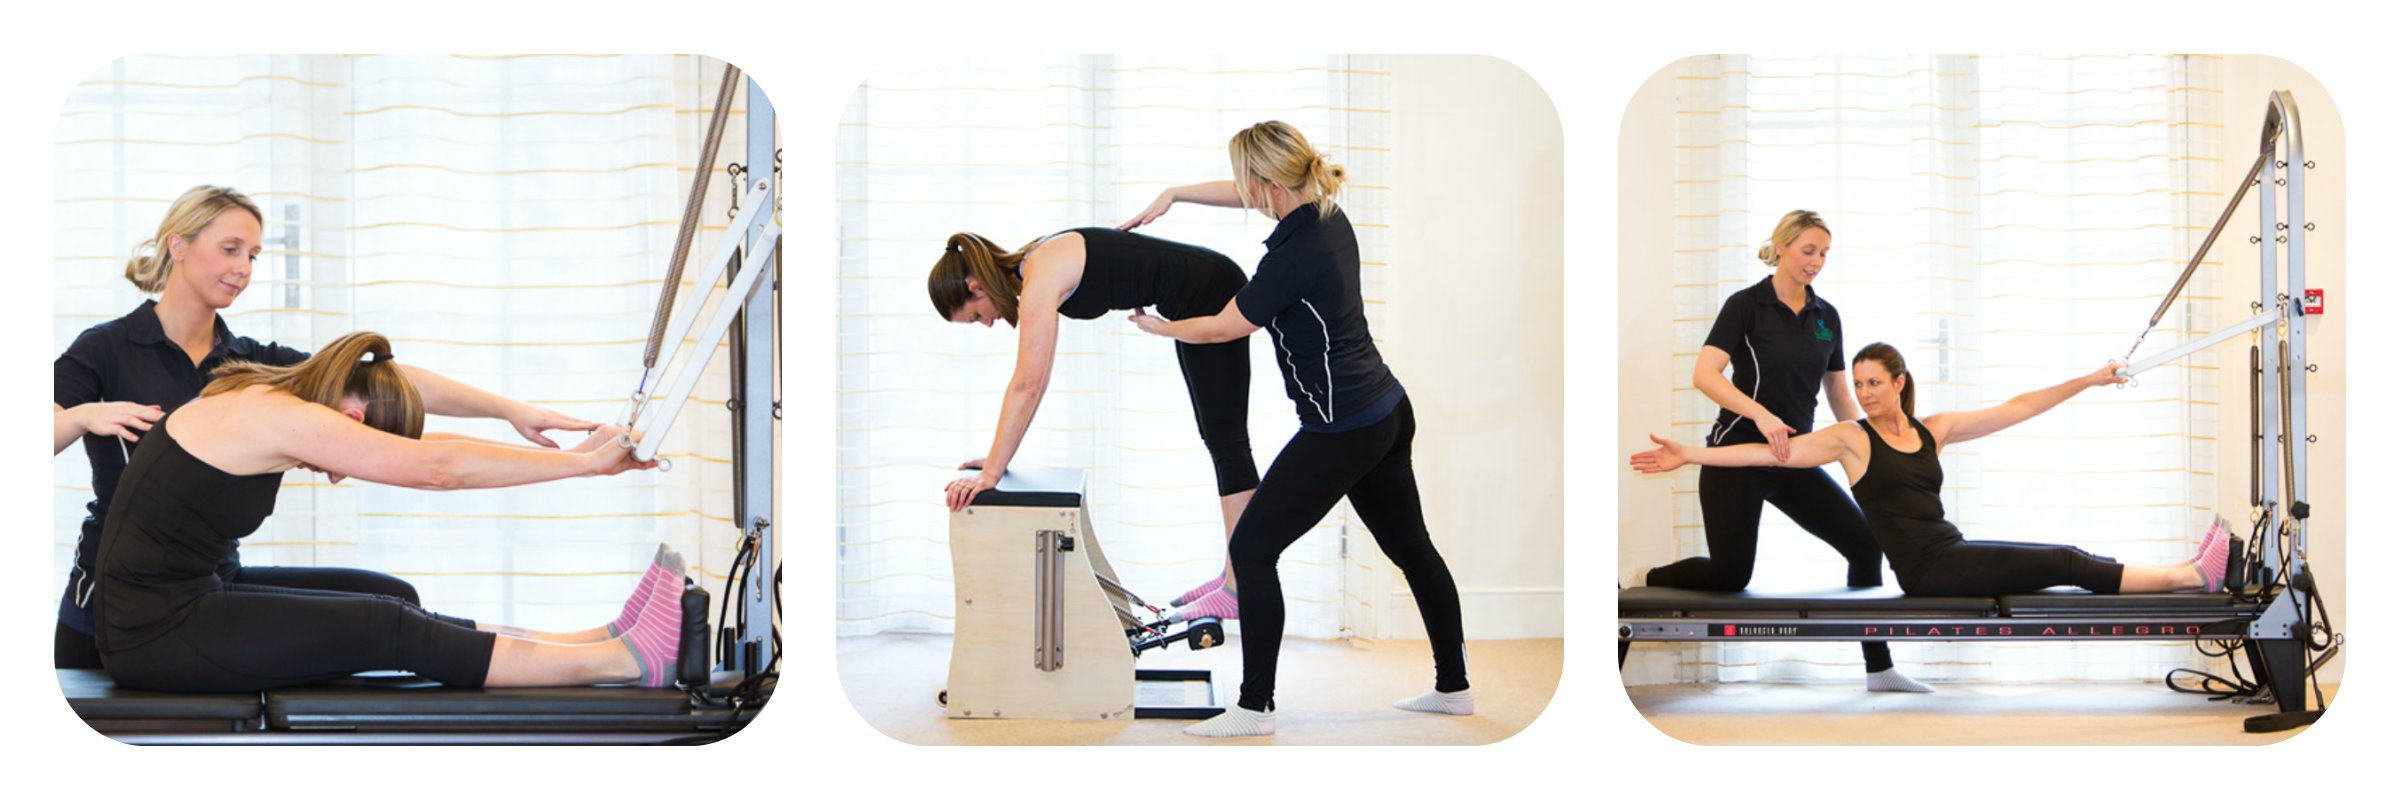 Pilates collage